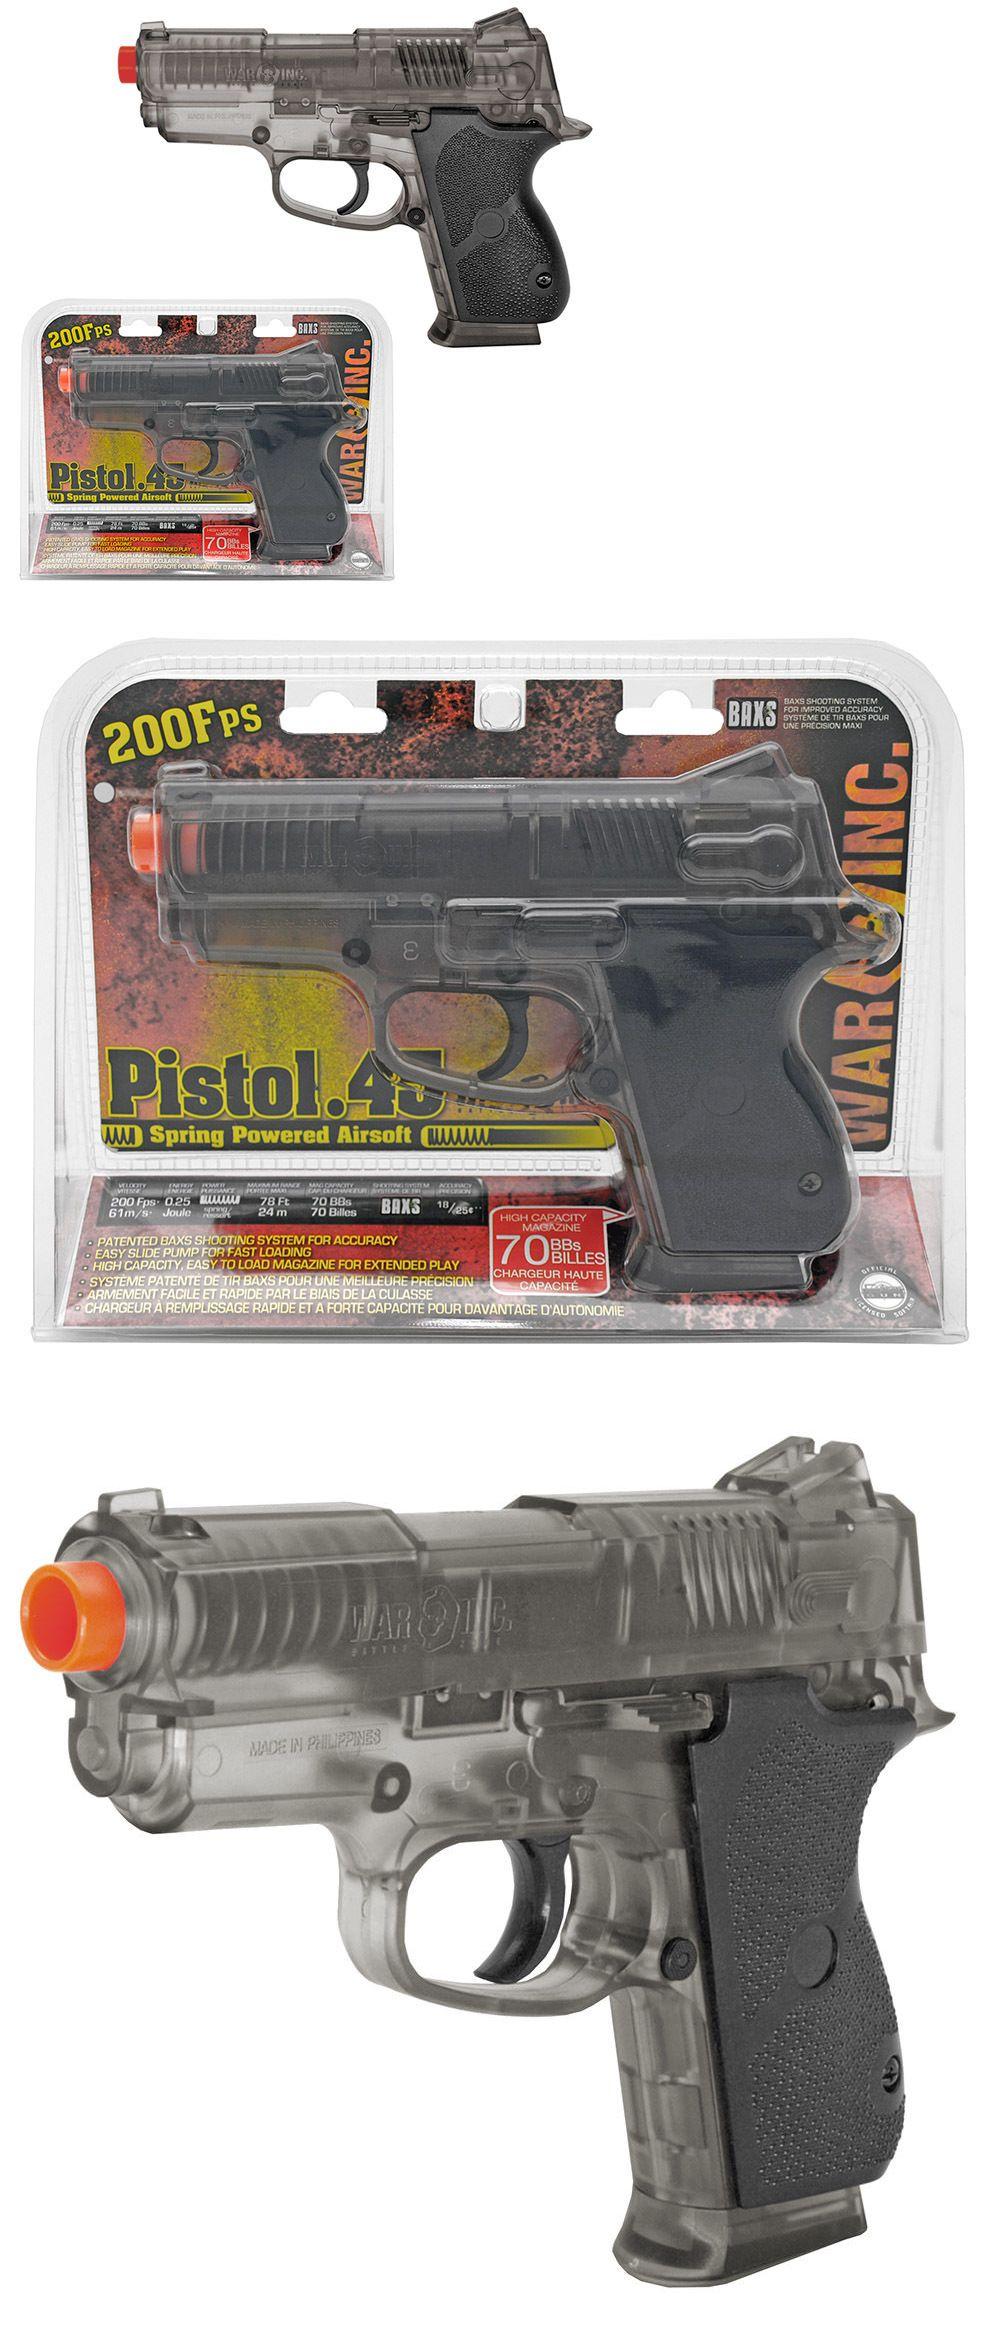 pistol 160923 7 full scale airsoft pistol handgun gun w bbs air